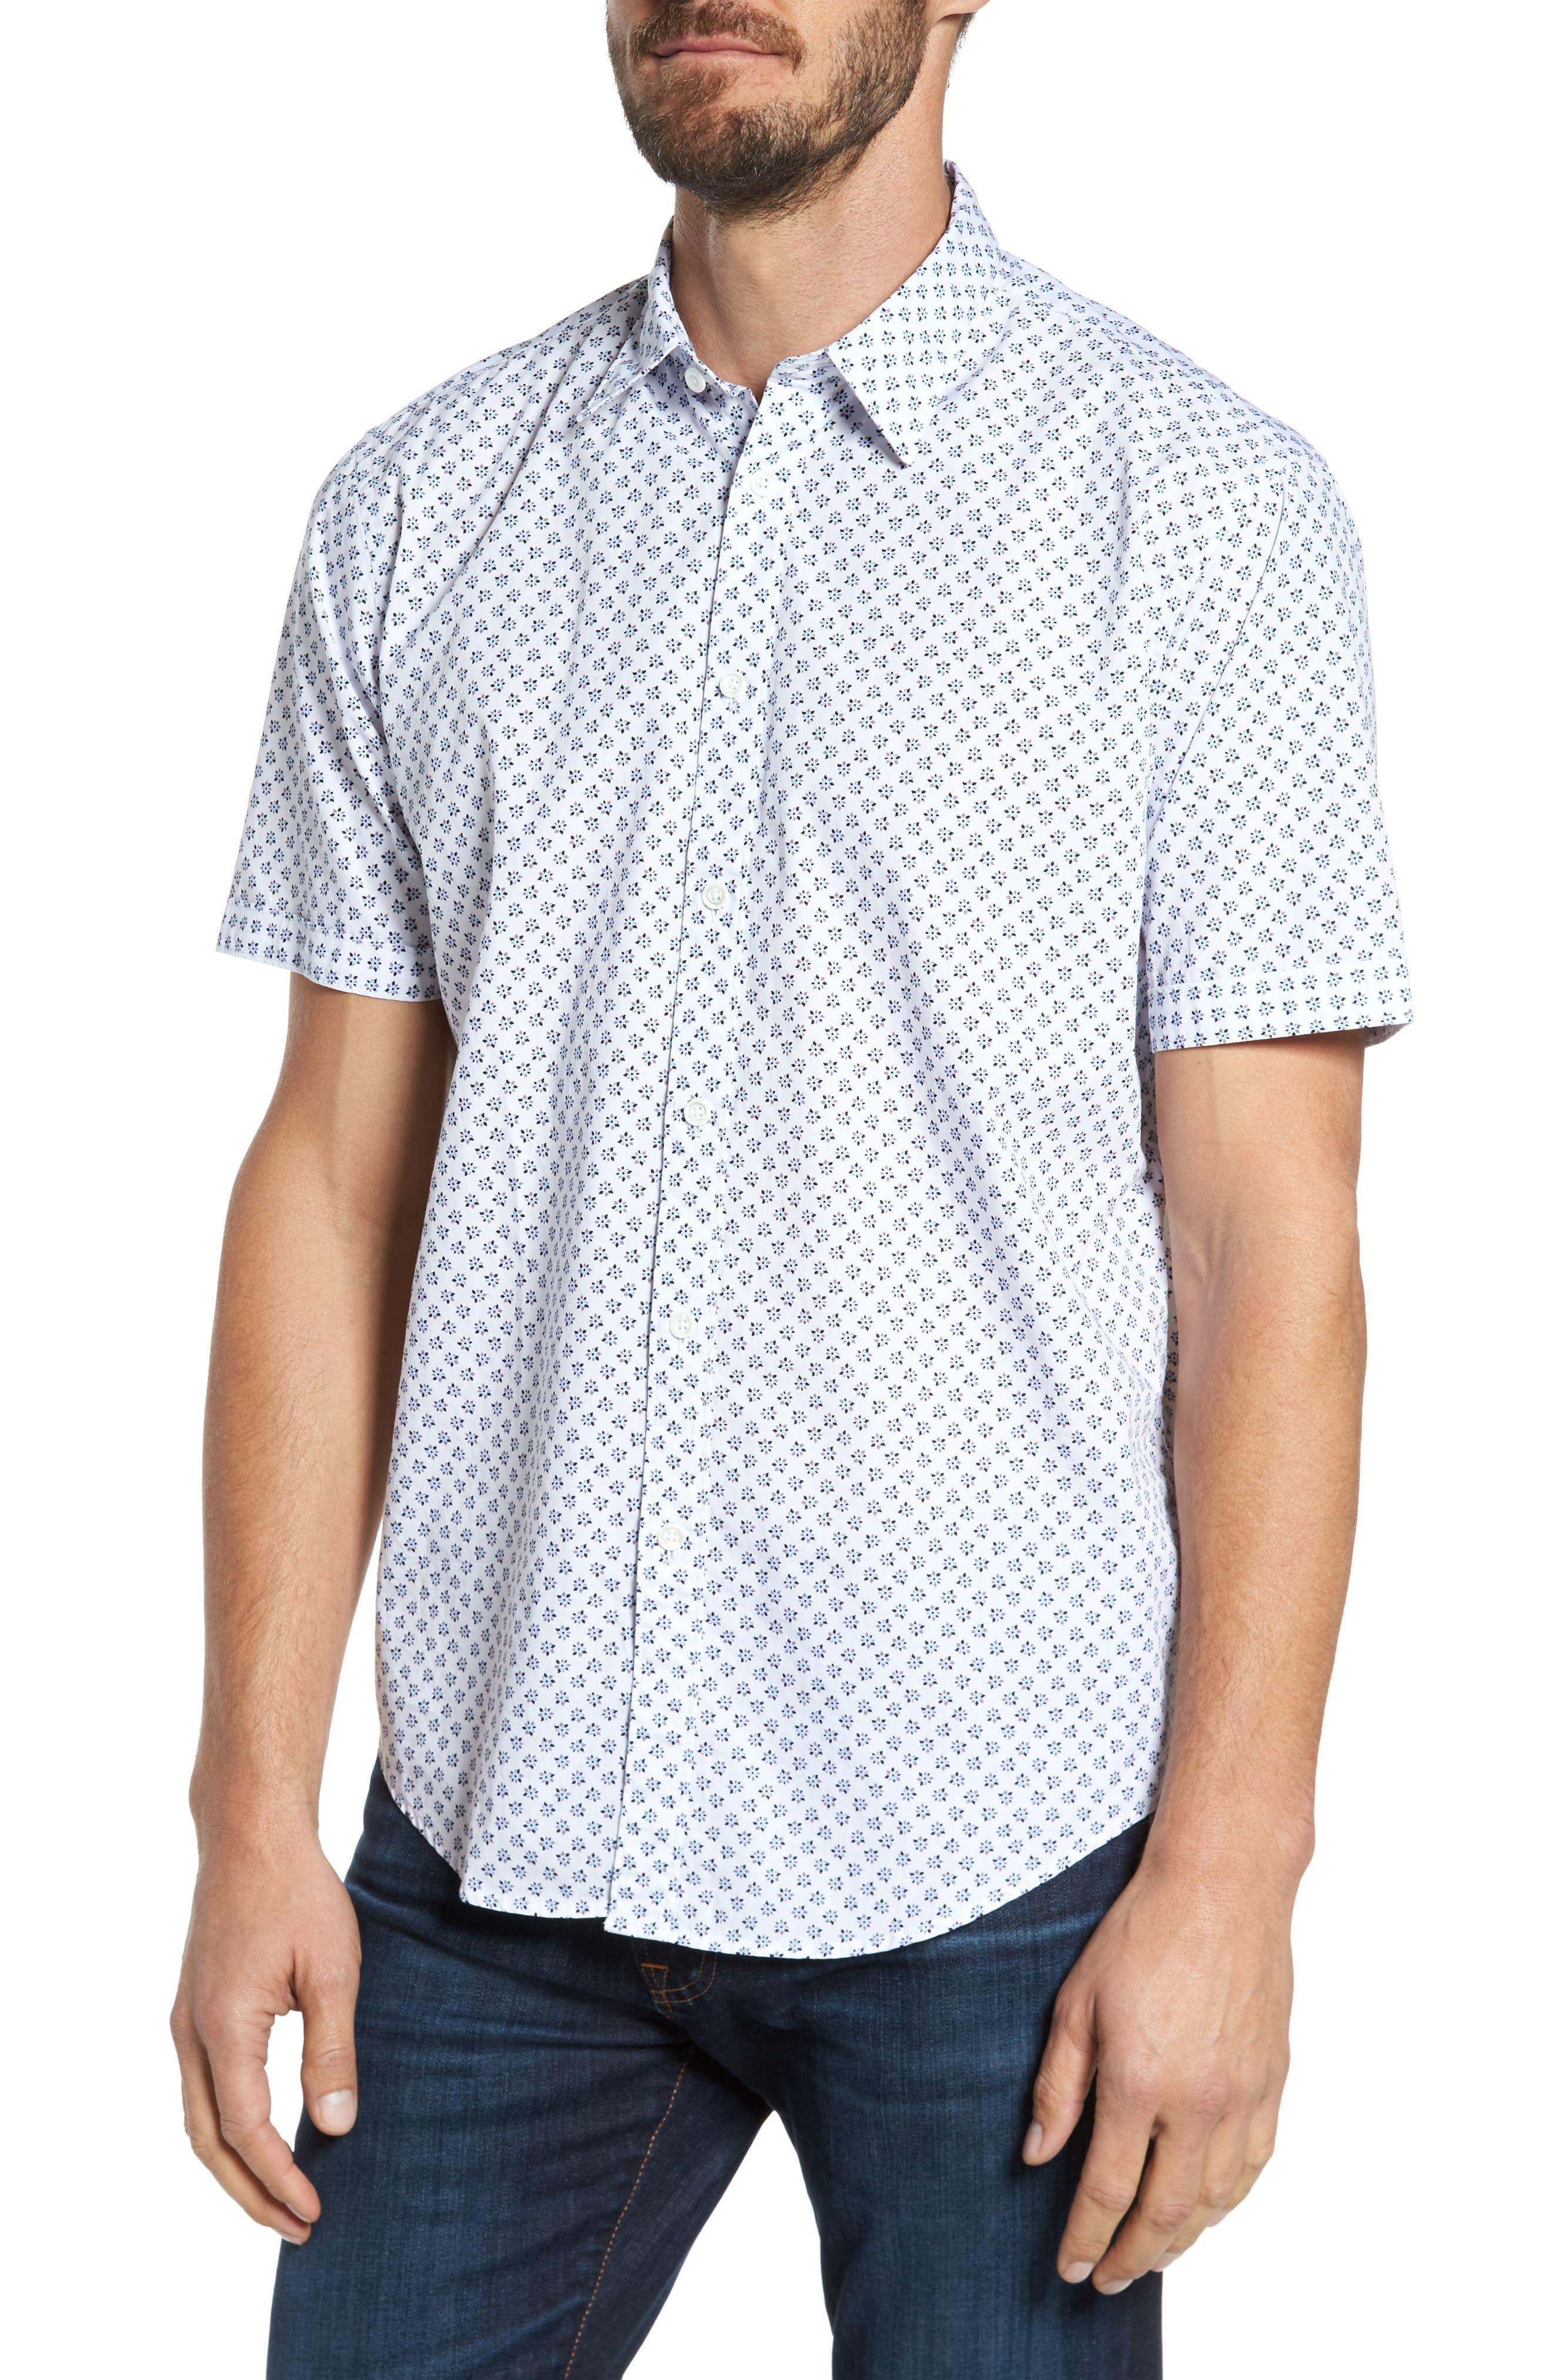 Main Image - Coastaoro Santo Regular Fit Print Sport Shirt